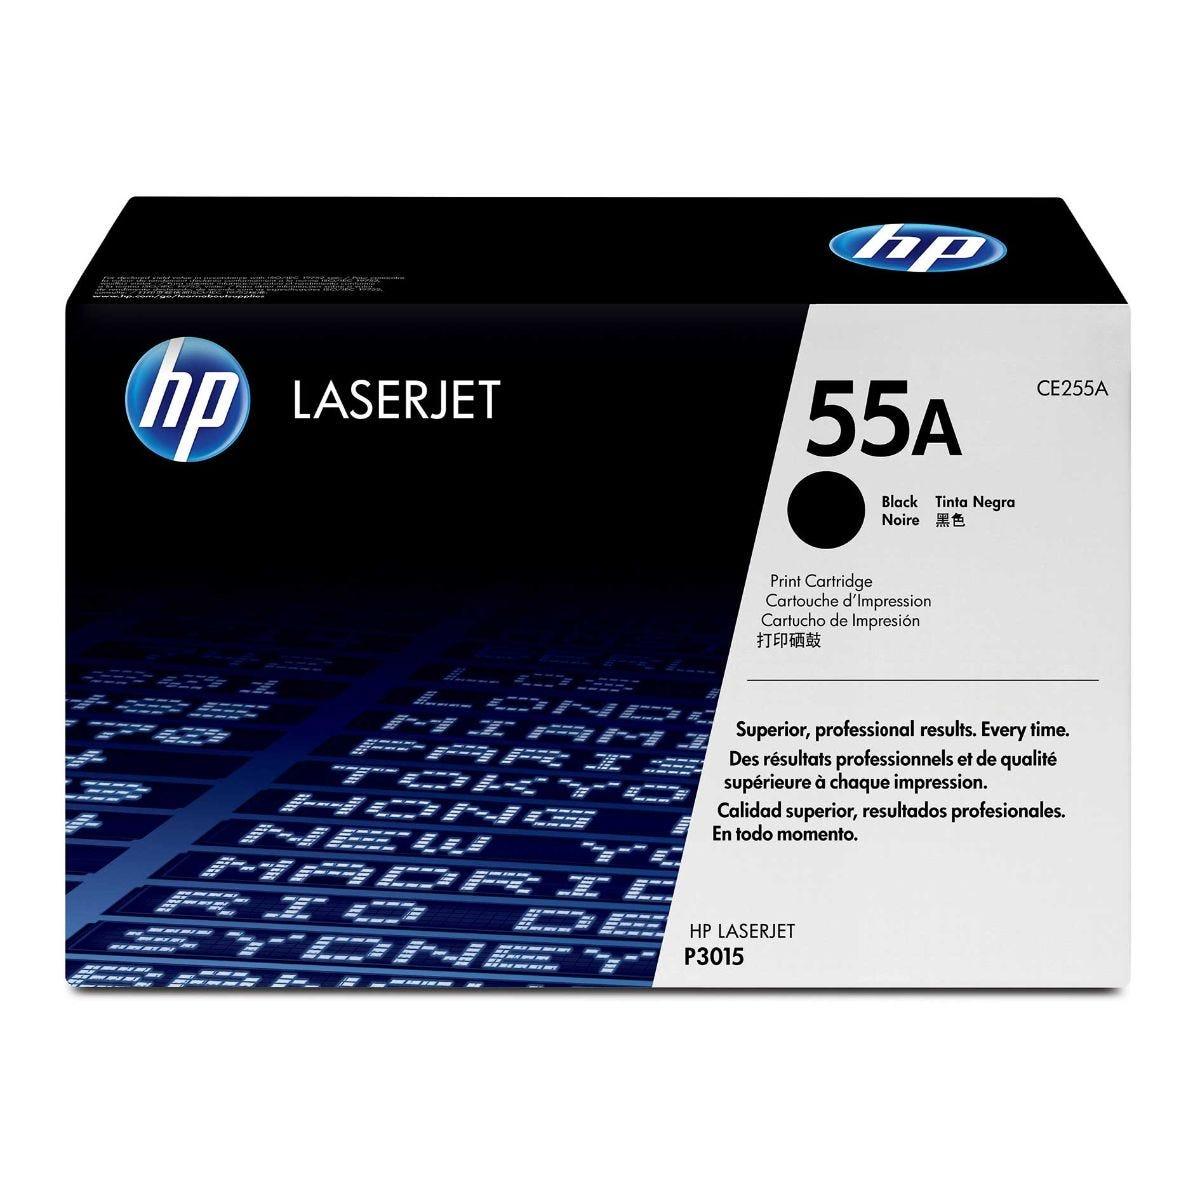 HP 55A Laserjet Printer Ink Toner Cartridge CE255A, Black